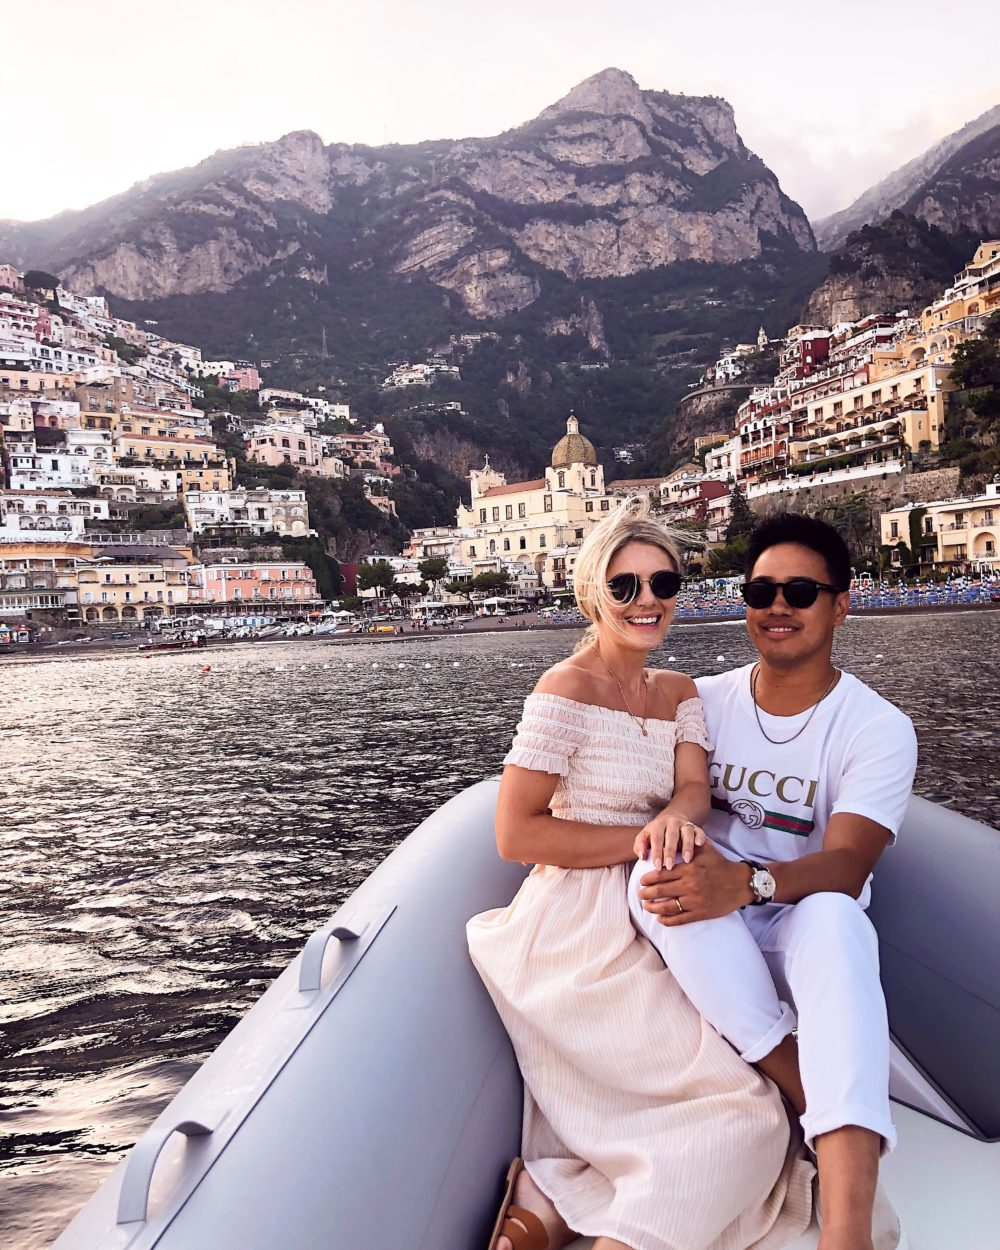 Positano-Italy-Katie-and-Jon-e1530896745304.jpg